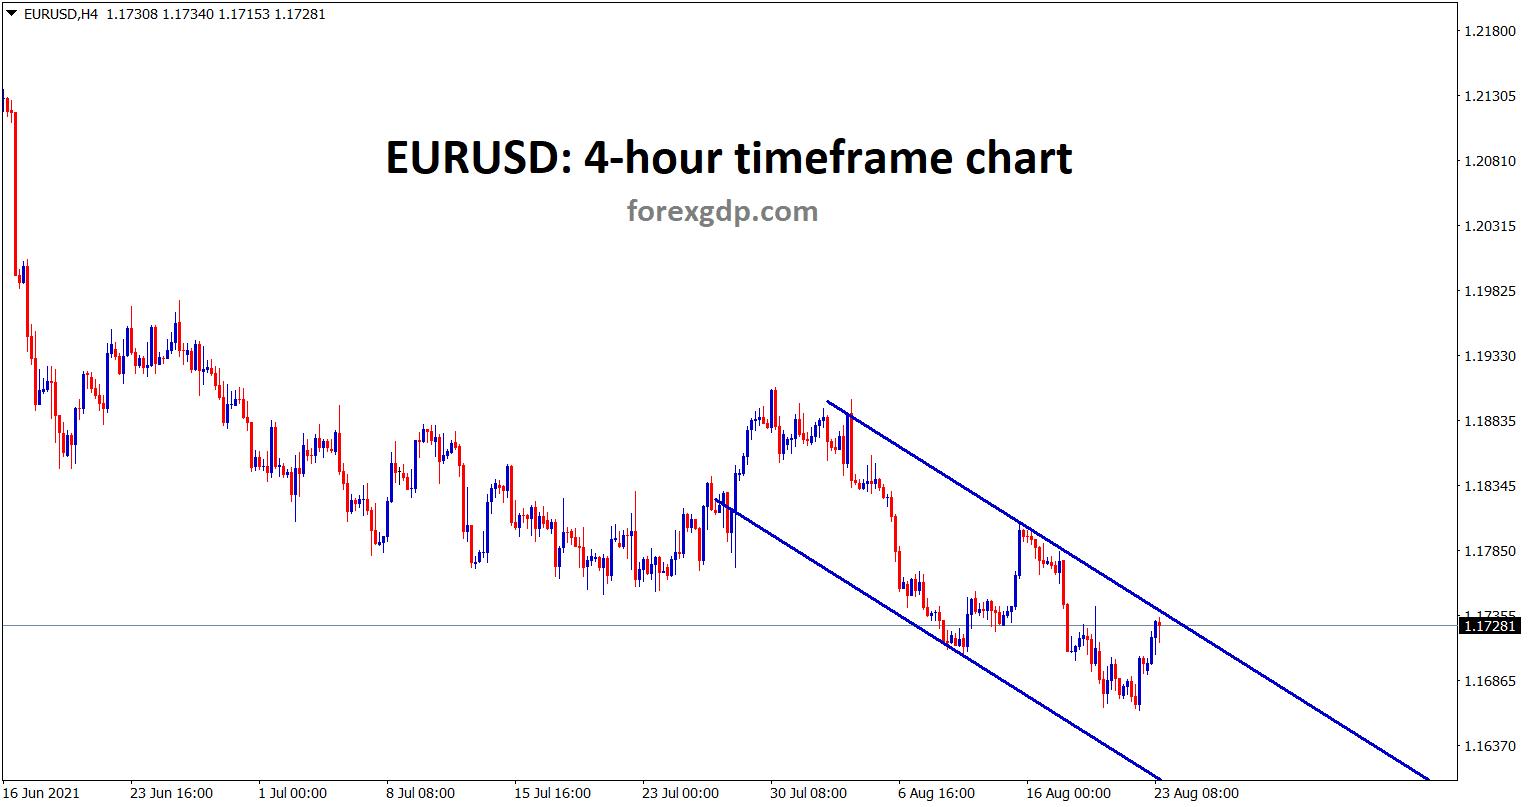 EURUSD is moving in a minor descending channel range